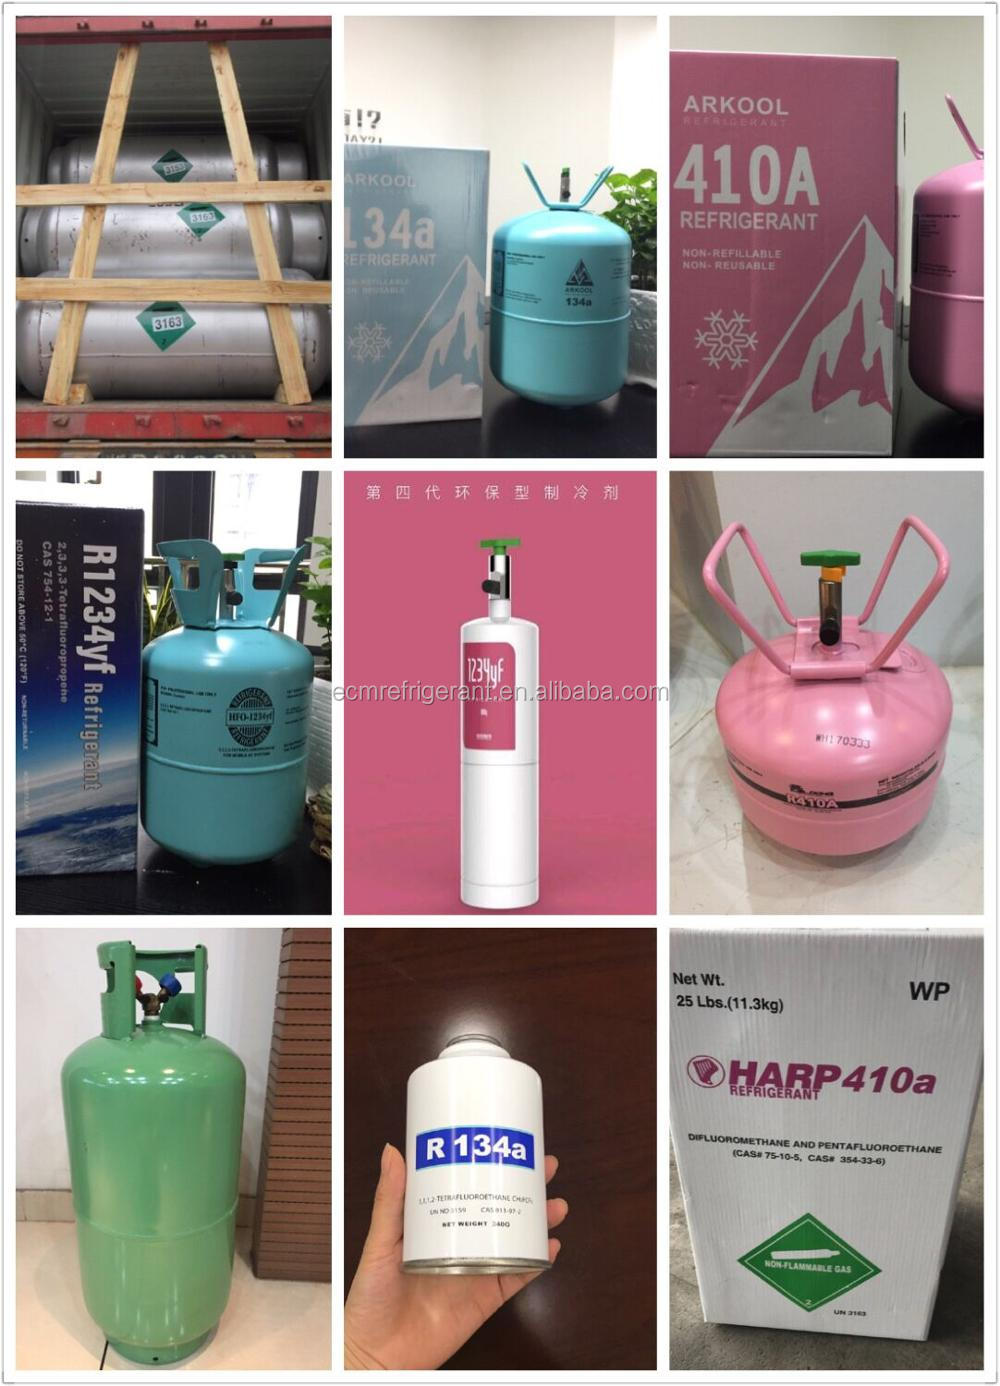 Refrigeration Gas R134a R1234yf R22a Hfc Mixed Refrigerant R410a R404a  R407c R507 - Buy Mixed Gas Refrigerant R410a,Hfc Refrigerant Gas